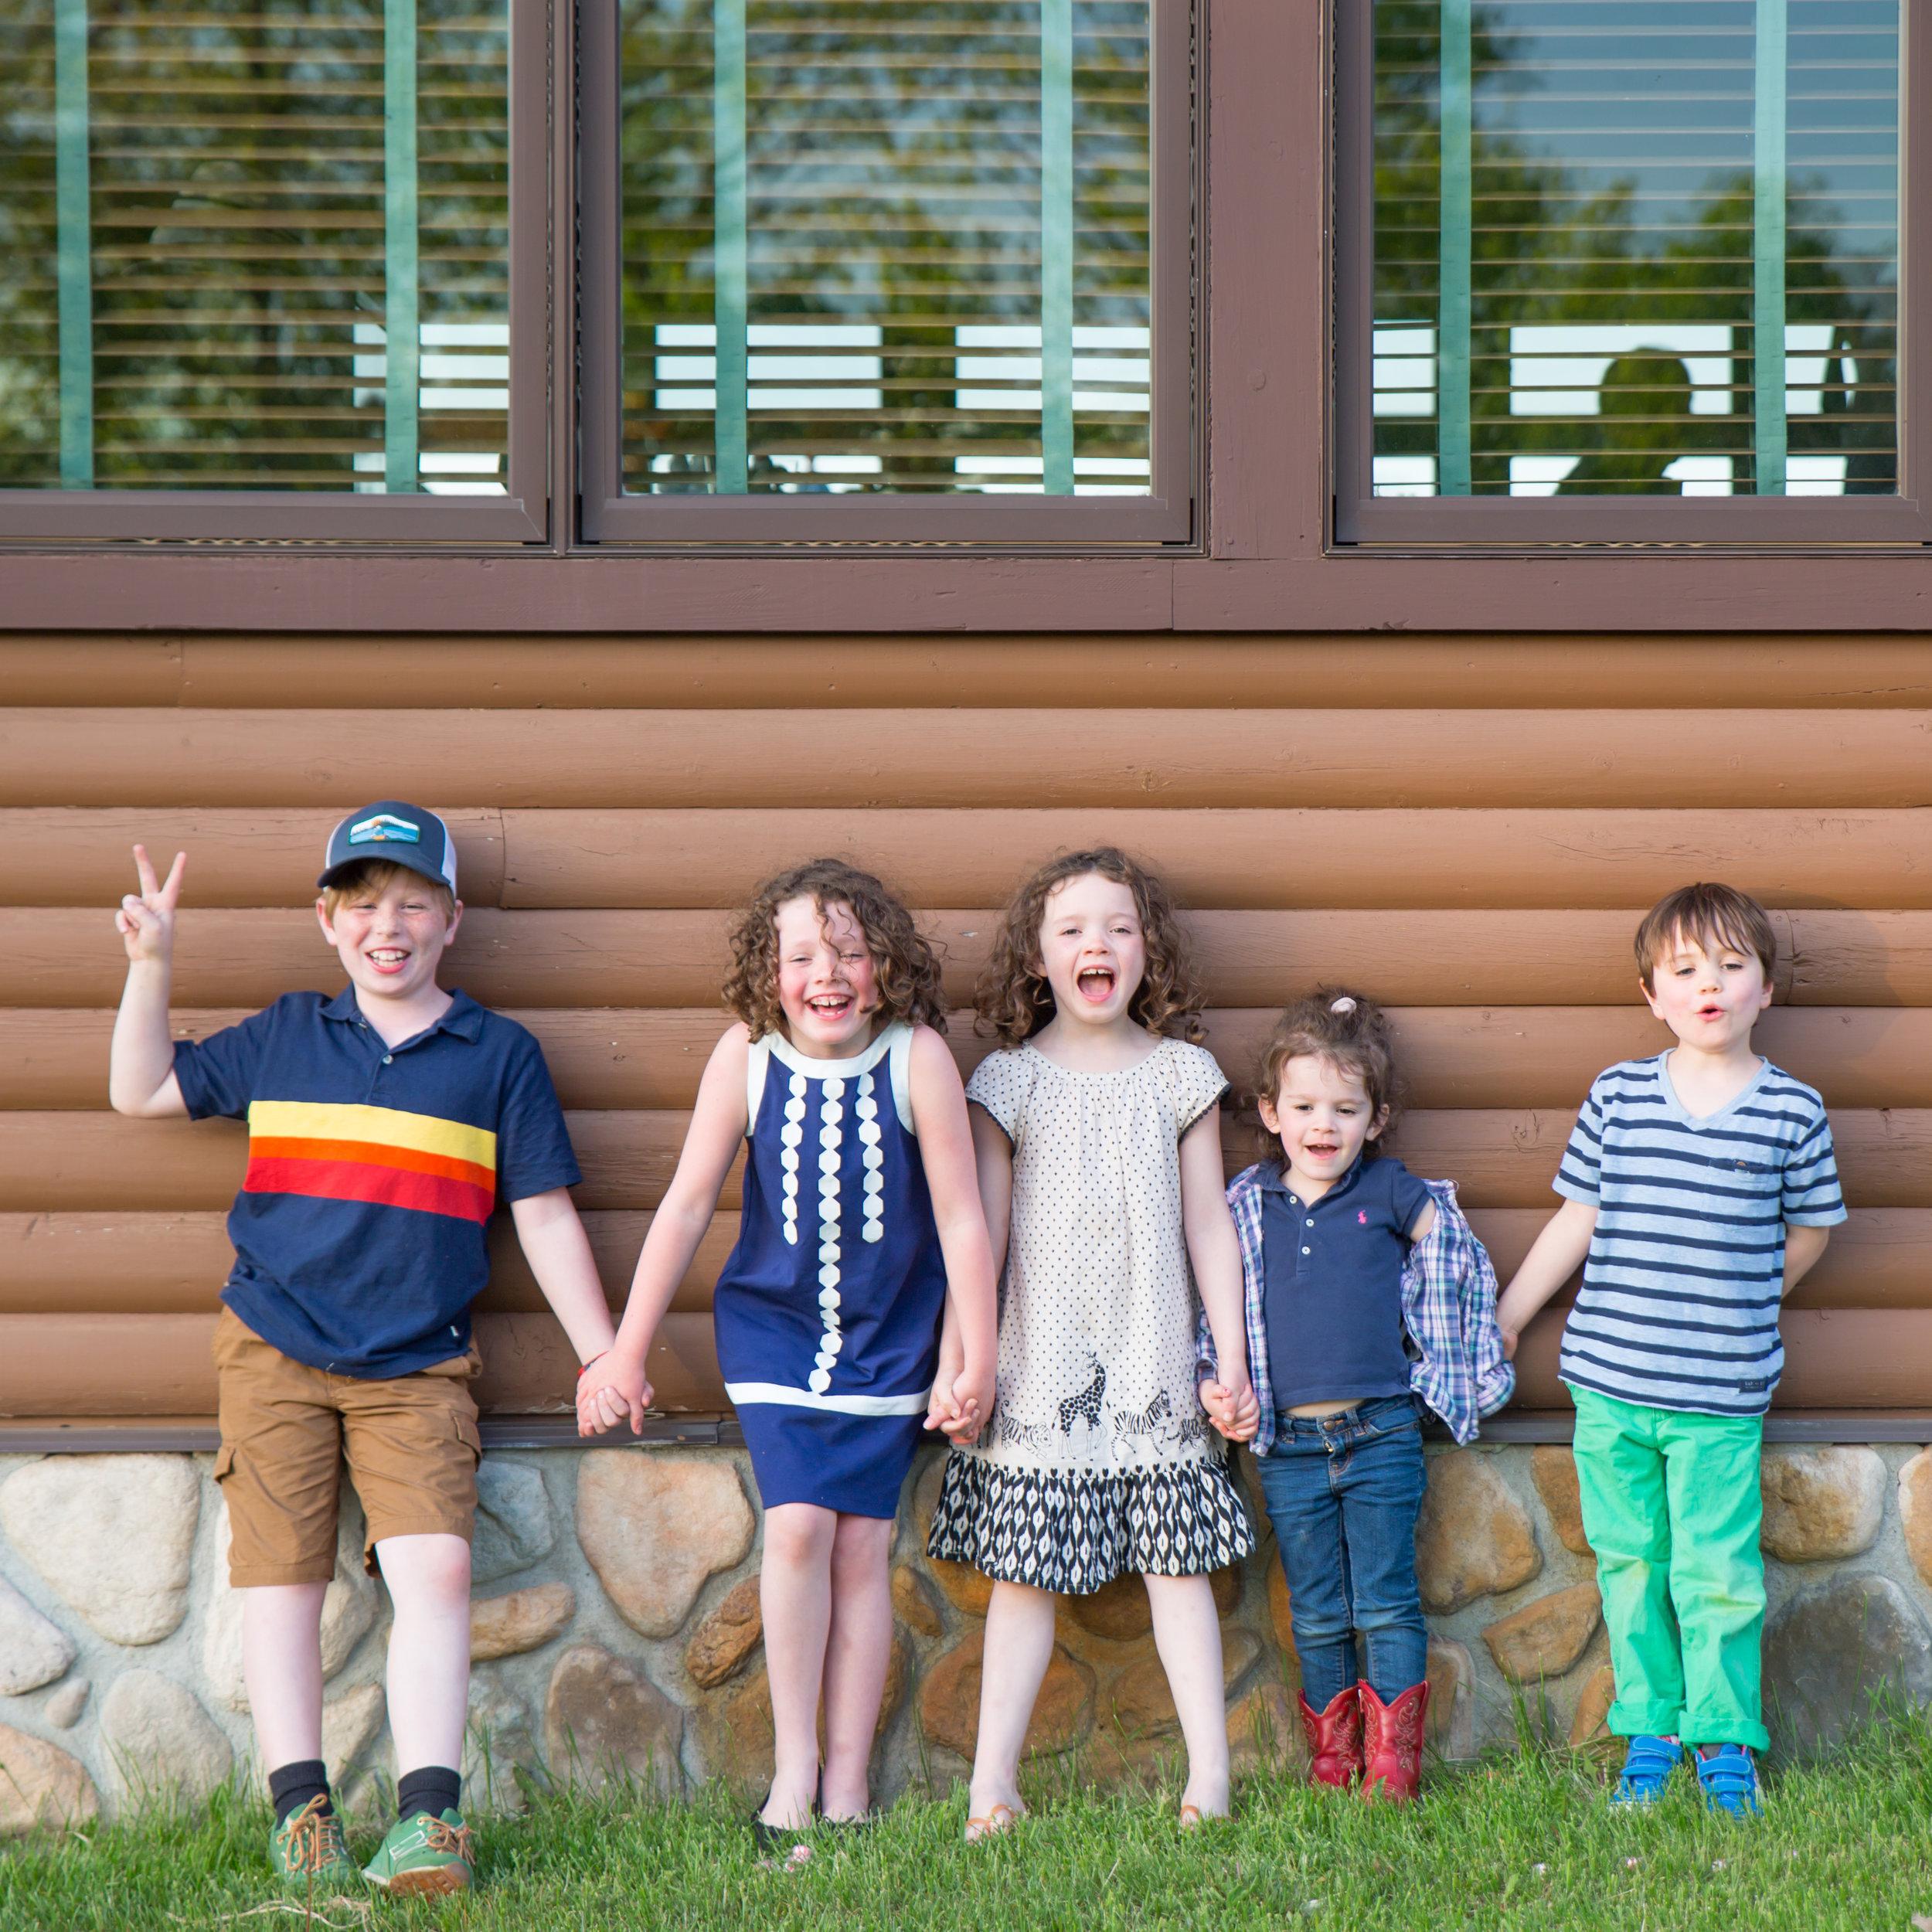 Ruttger's Bay Lake Lodge, MN   Memorial Day Weekend 2017 at this classic Minnesotan family resort. Fishing, tennis, golf, swimming and lots of family fun!